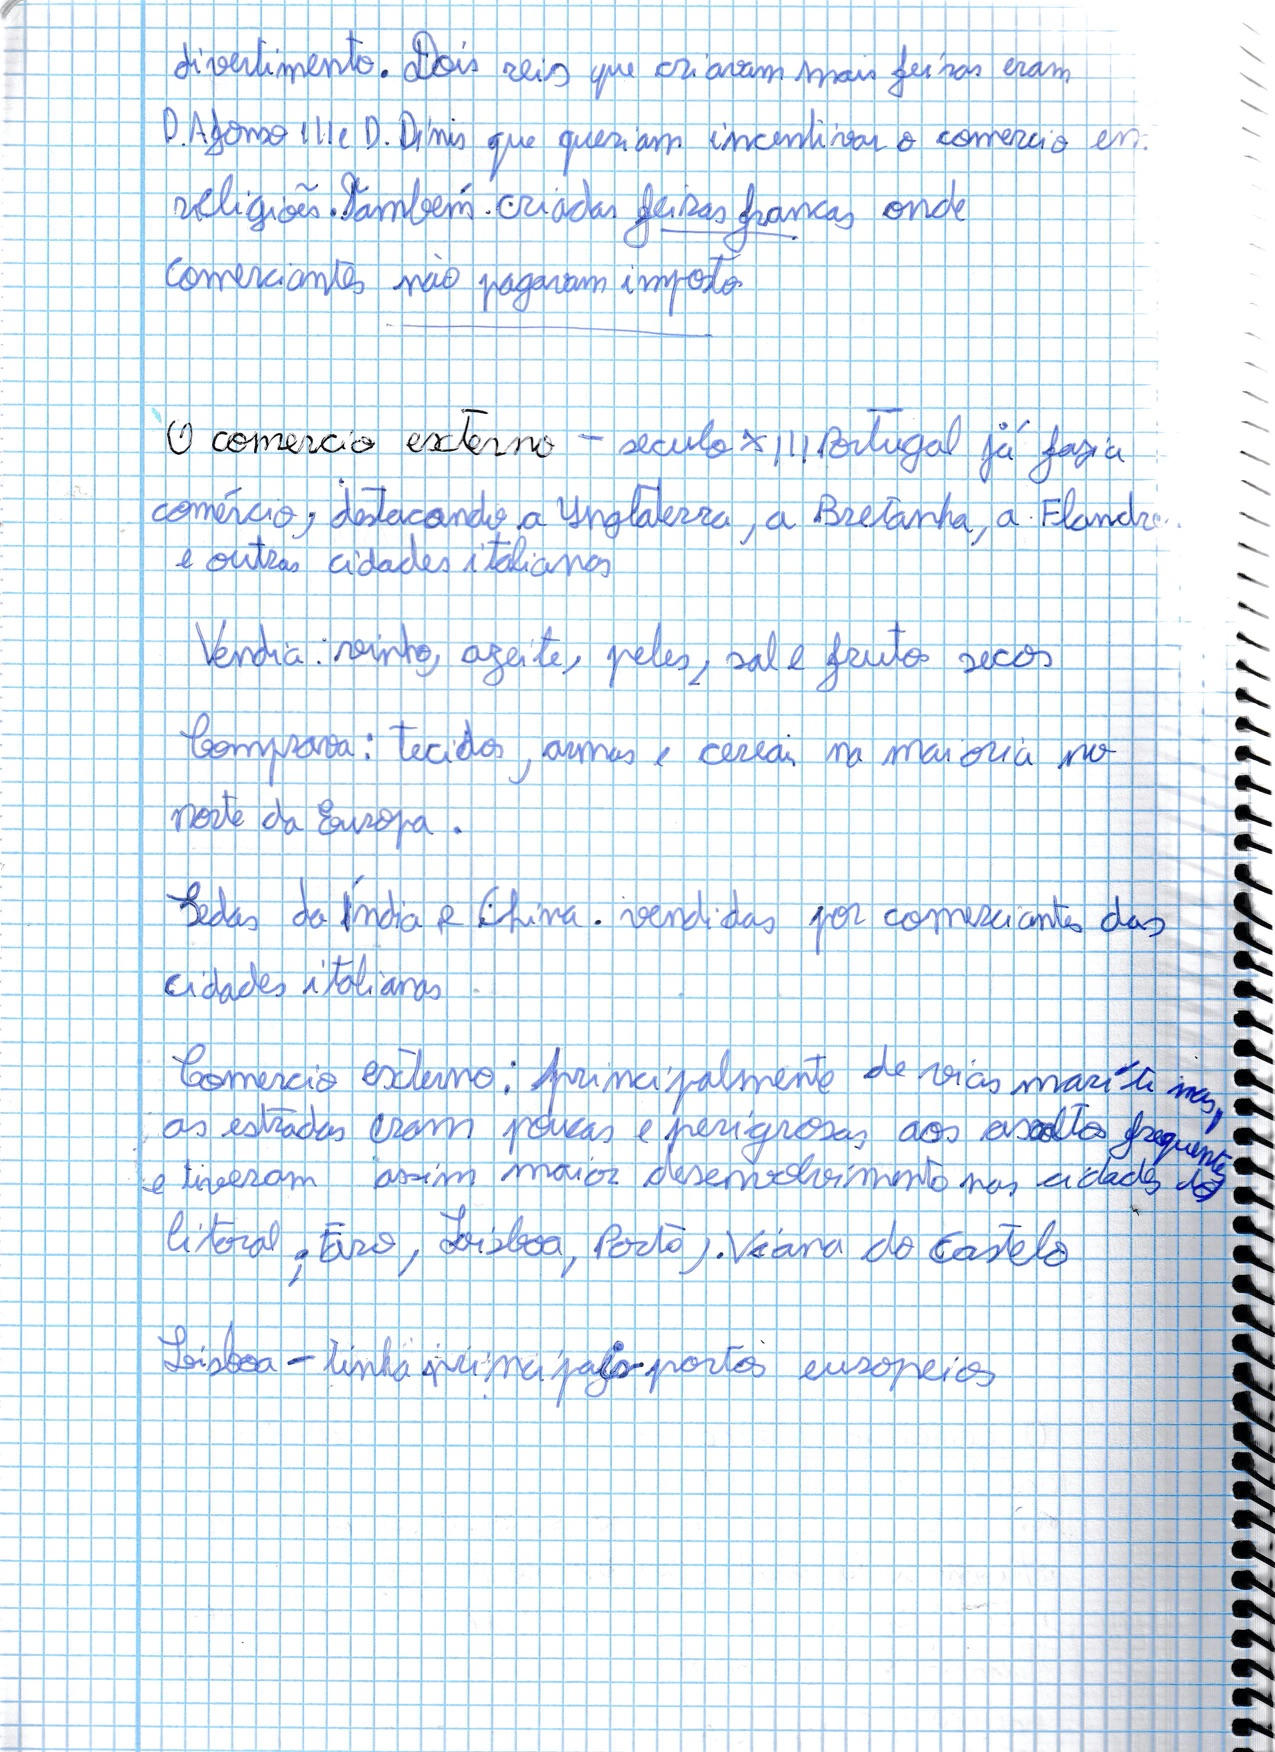 História Caderno Resumo 5º Juan by Juan Cuadrado - Illustrated by Juan Cuadrado Tejeda - Ourboox.com